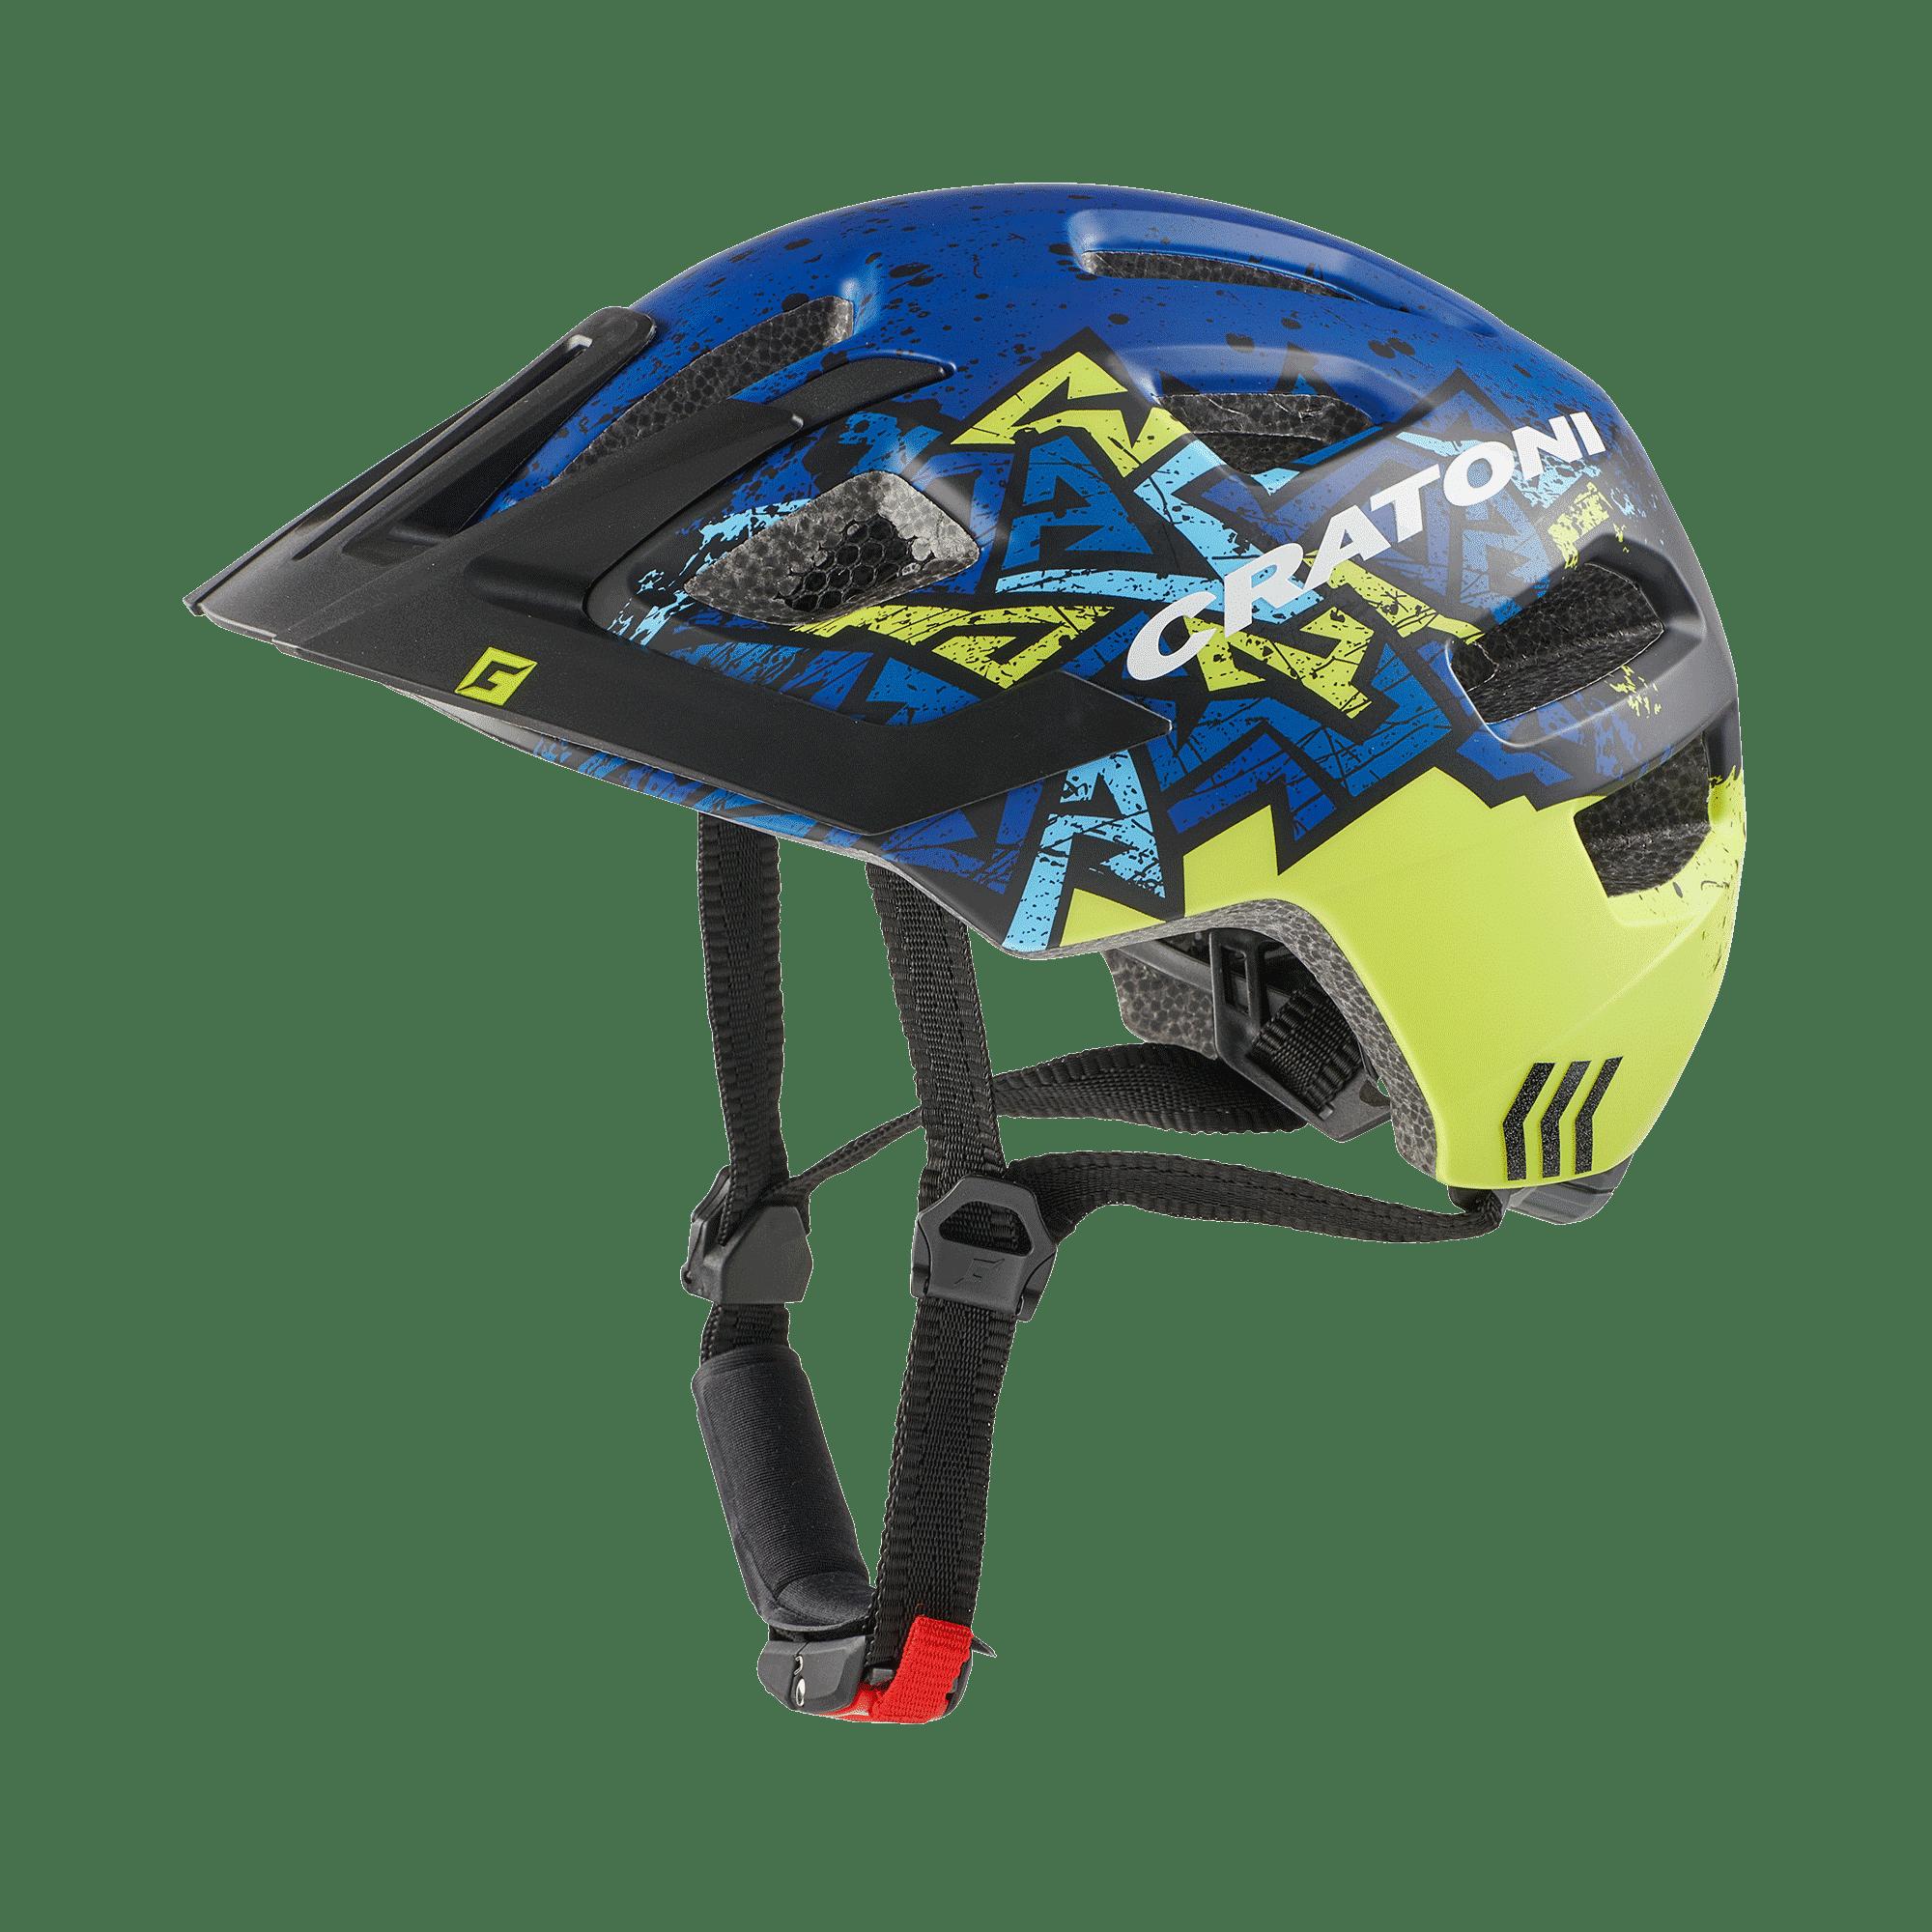 Maxster-Pro wild blue matt